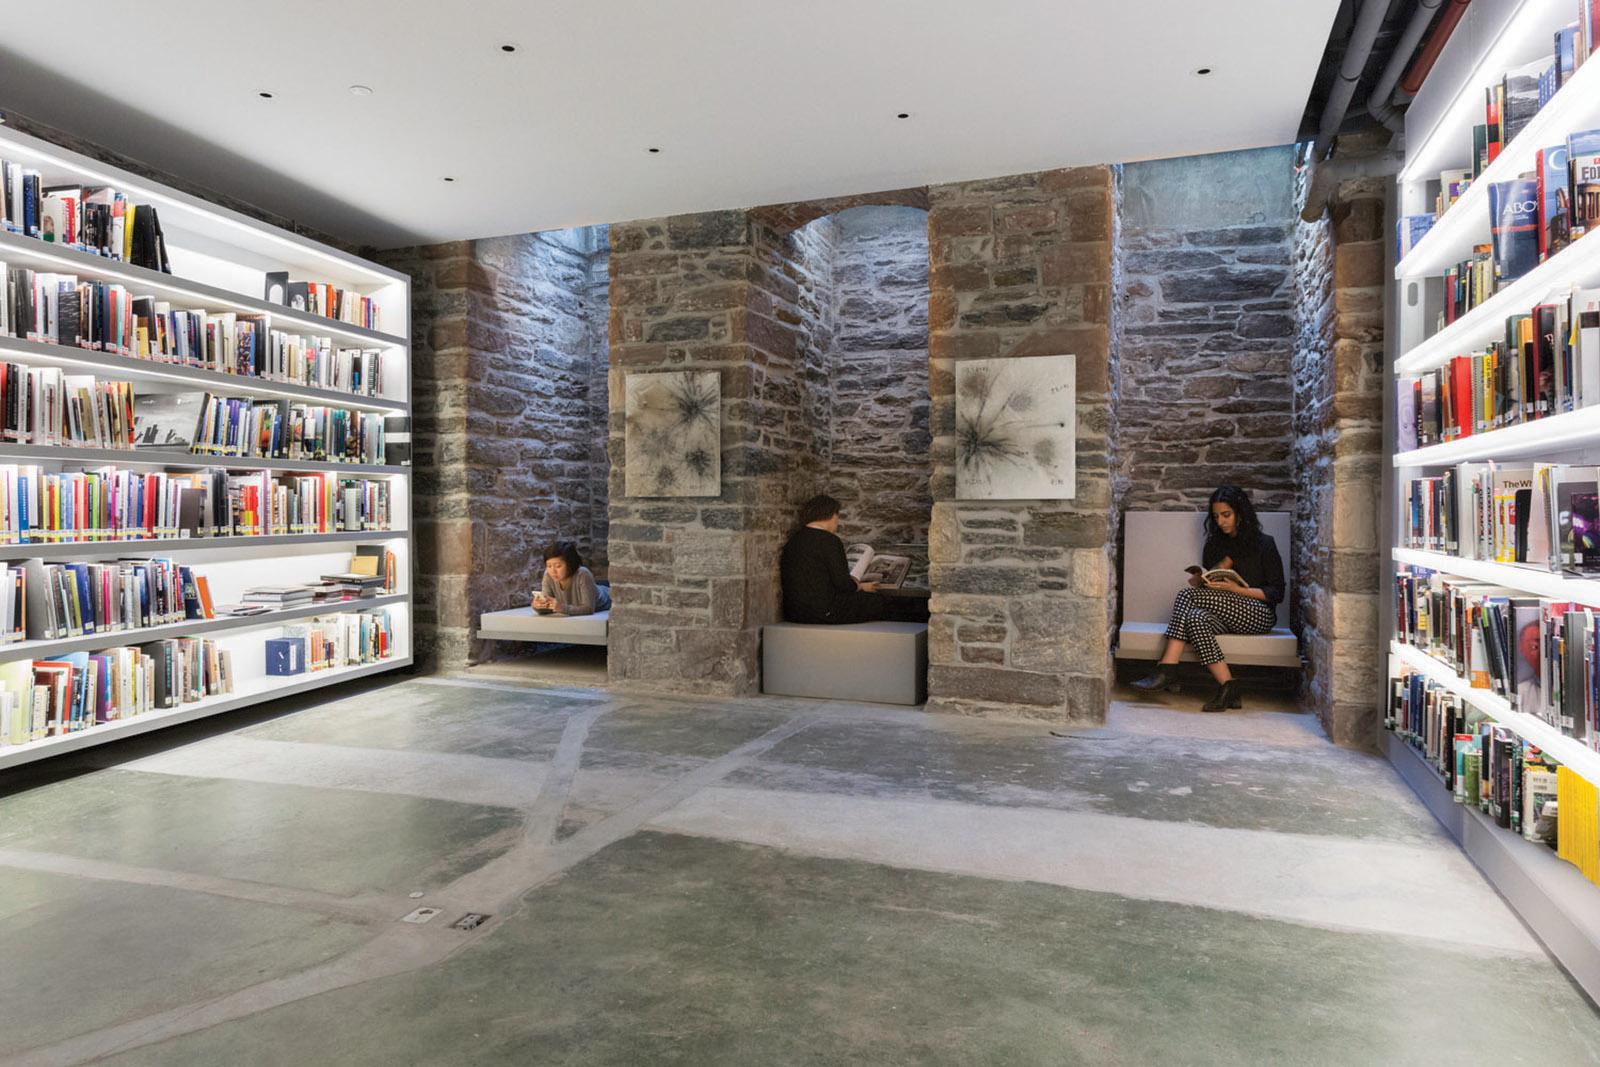 08-Cai Guo Qiang Studio-library.jpg